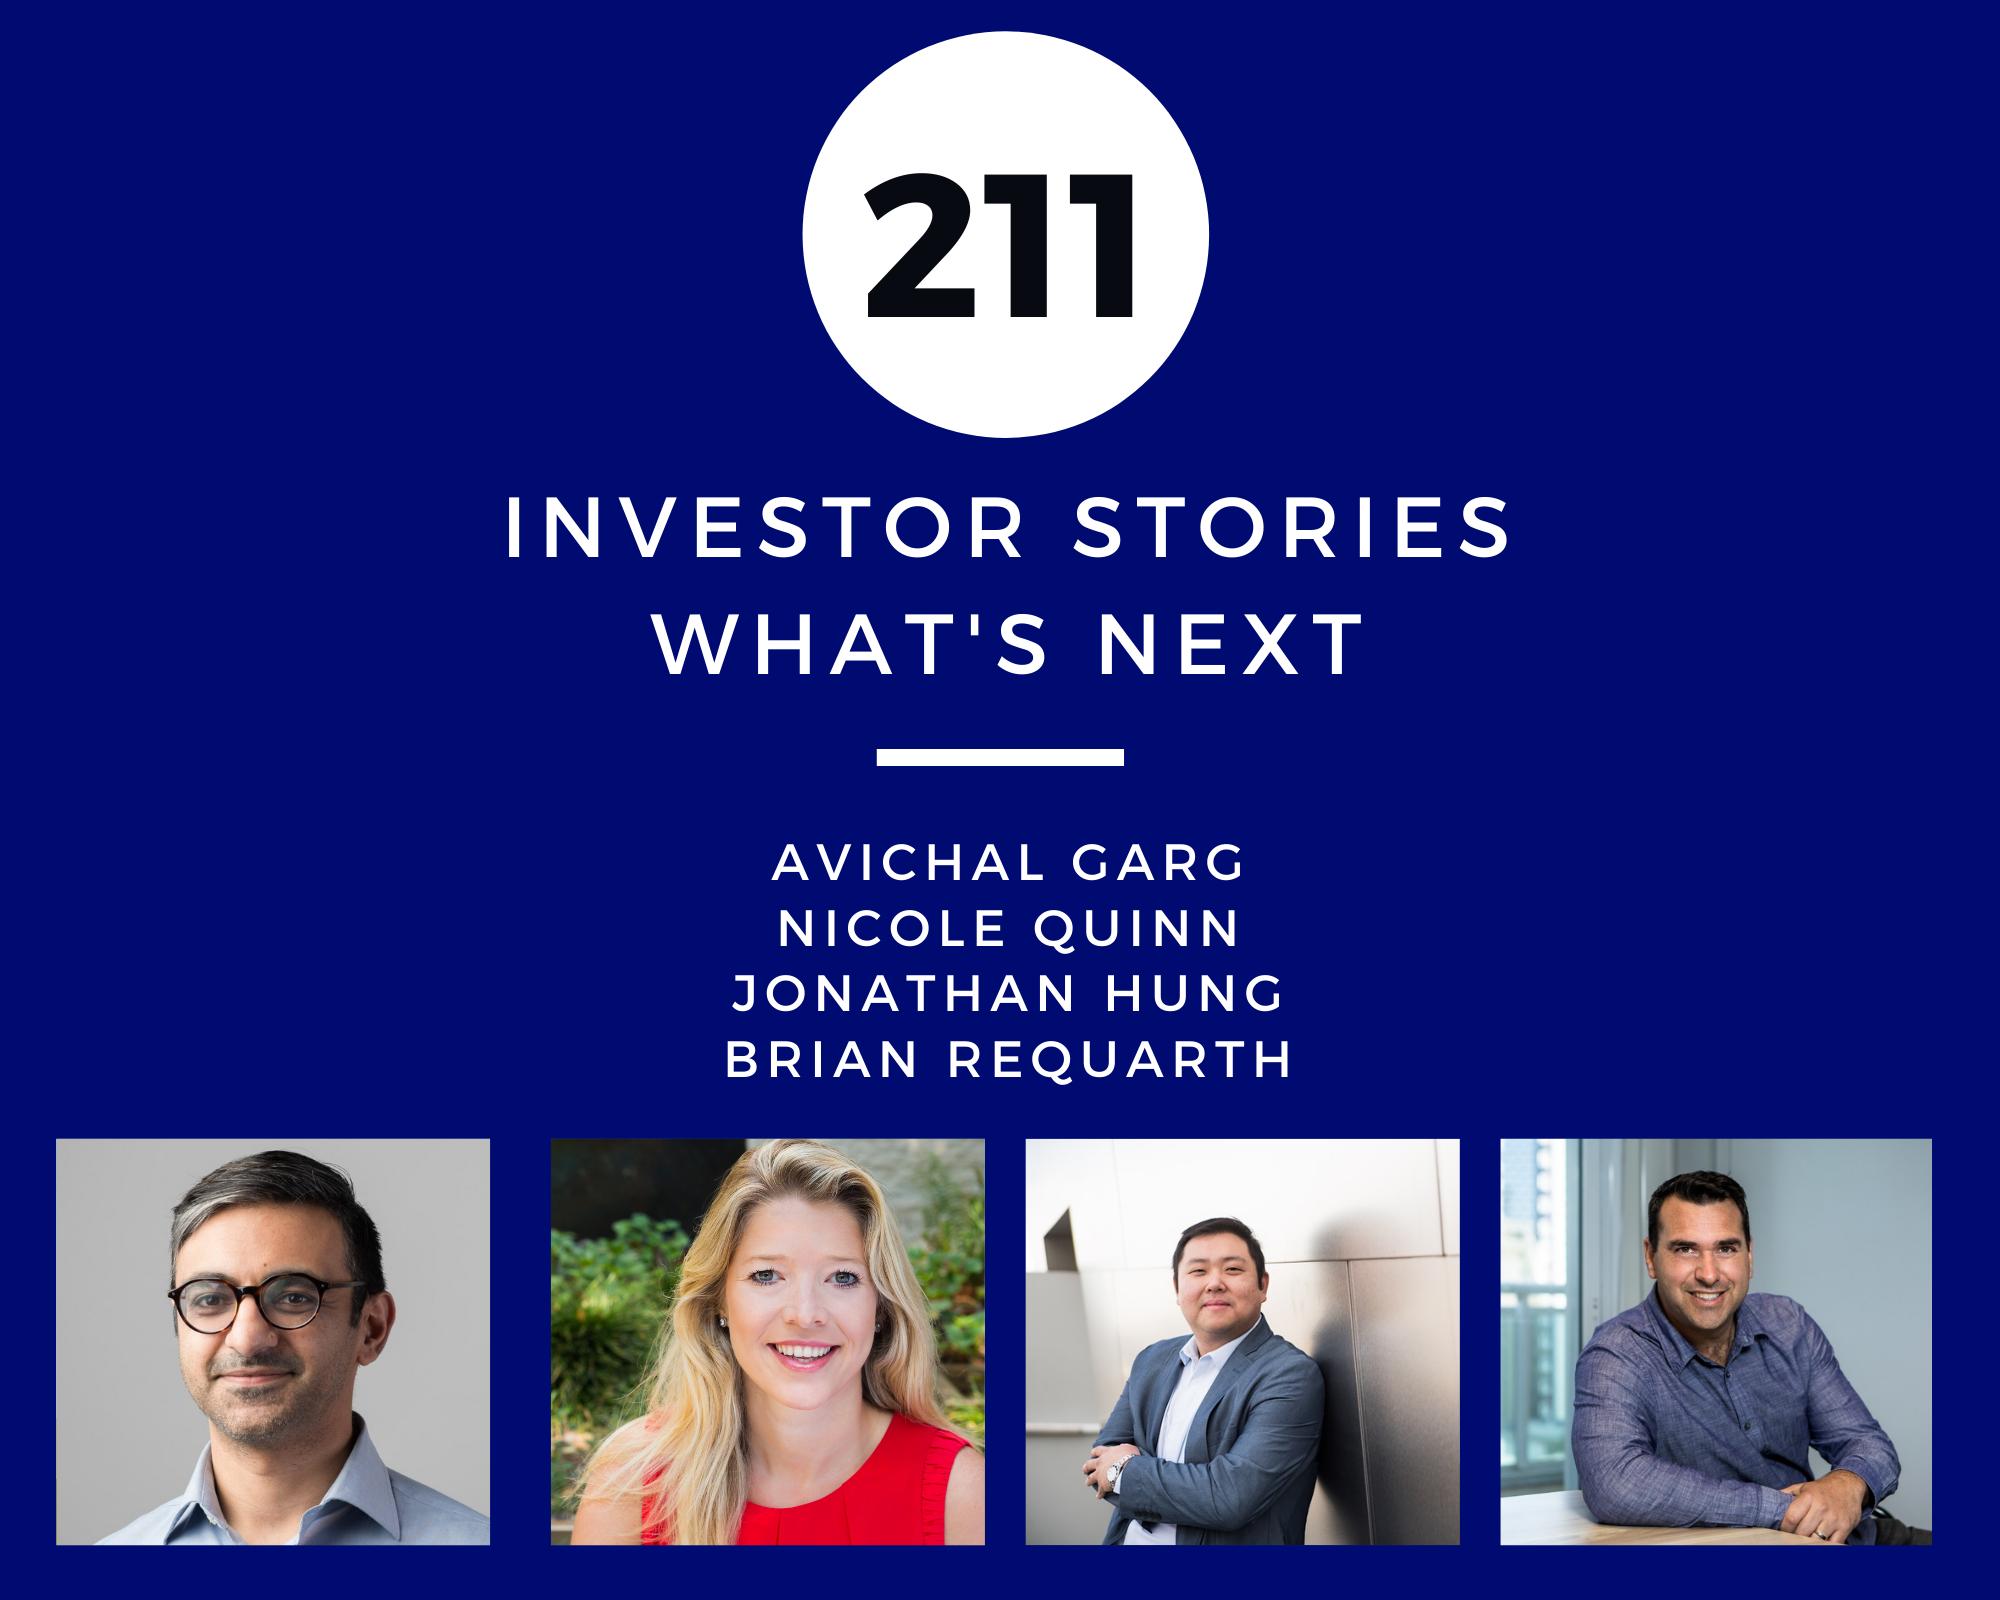 Investor Stories 211: What's Next (Garg, Quinn, Hung, Requarth)